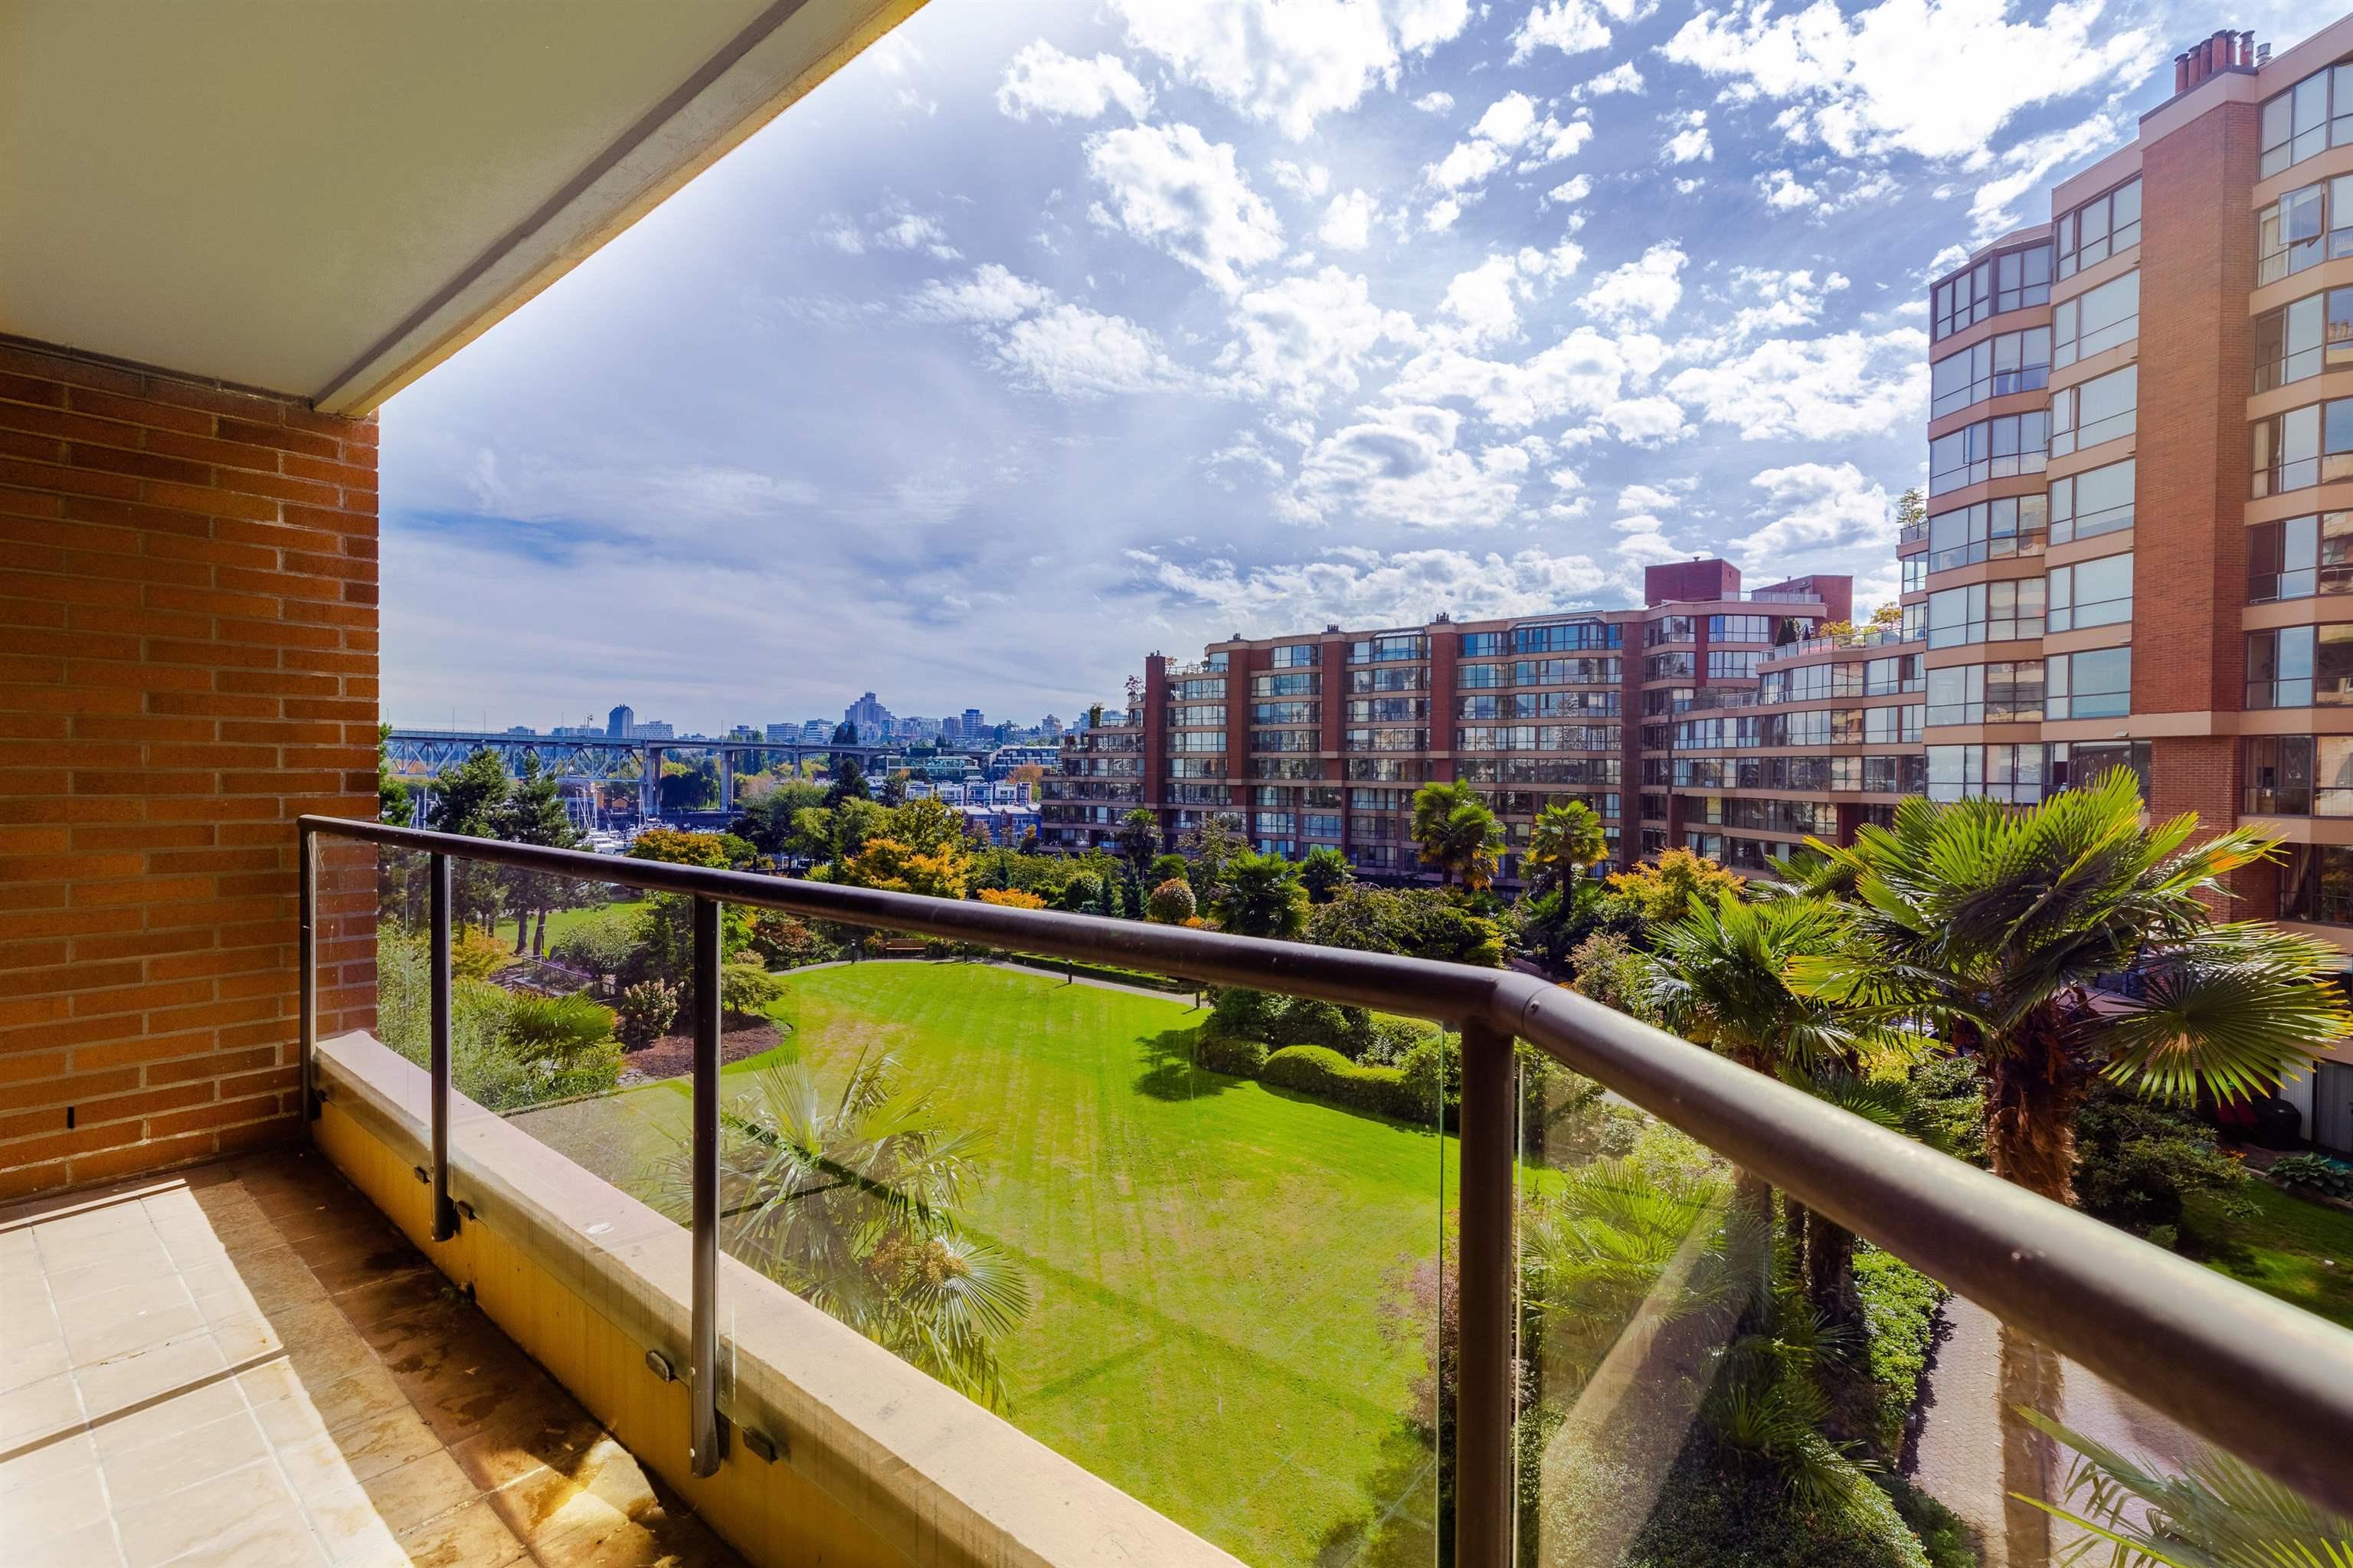 406 1450 PENNYFARTHING DRIVE - False Creek Apartment/Condo for sale, 2 Bedrooms (R2617259) - #34